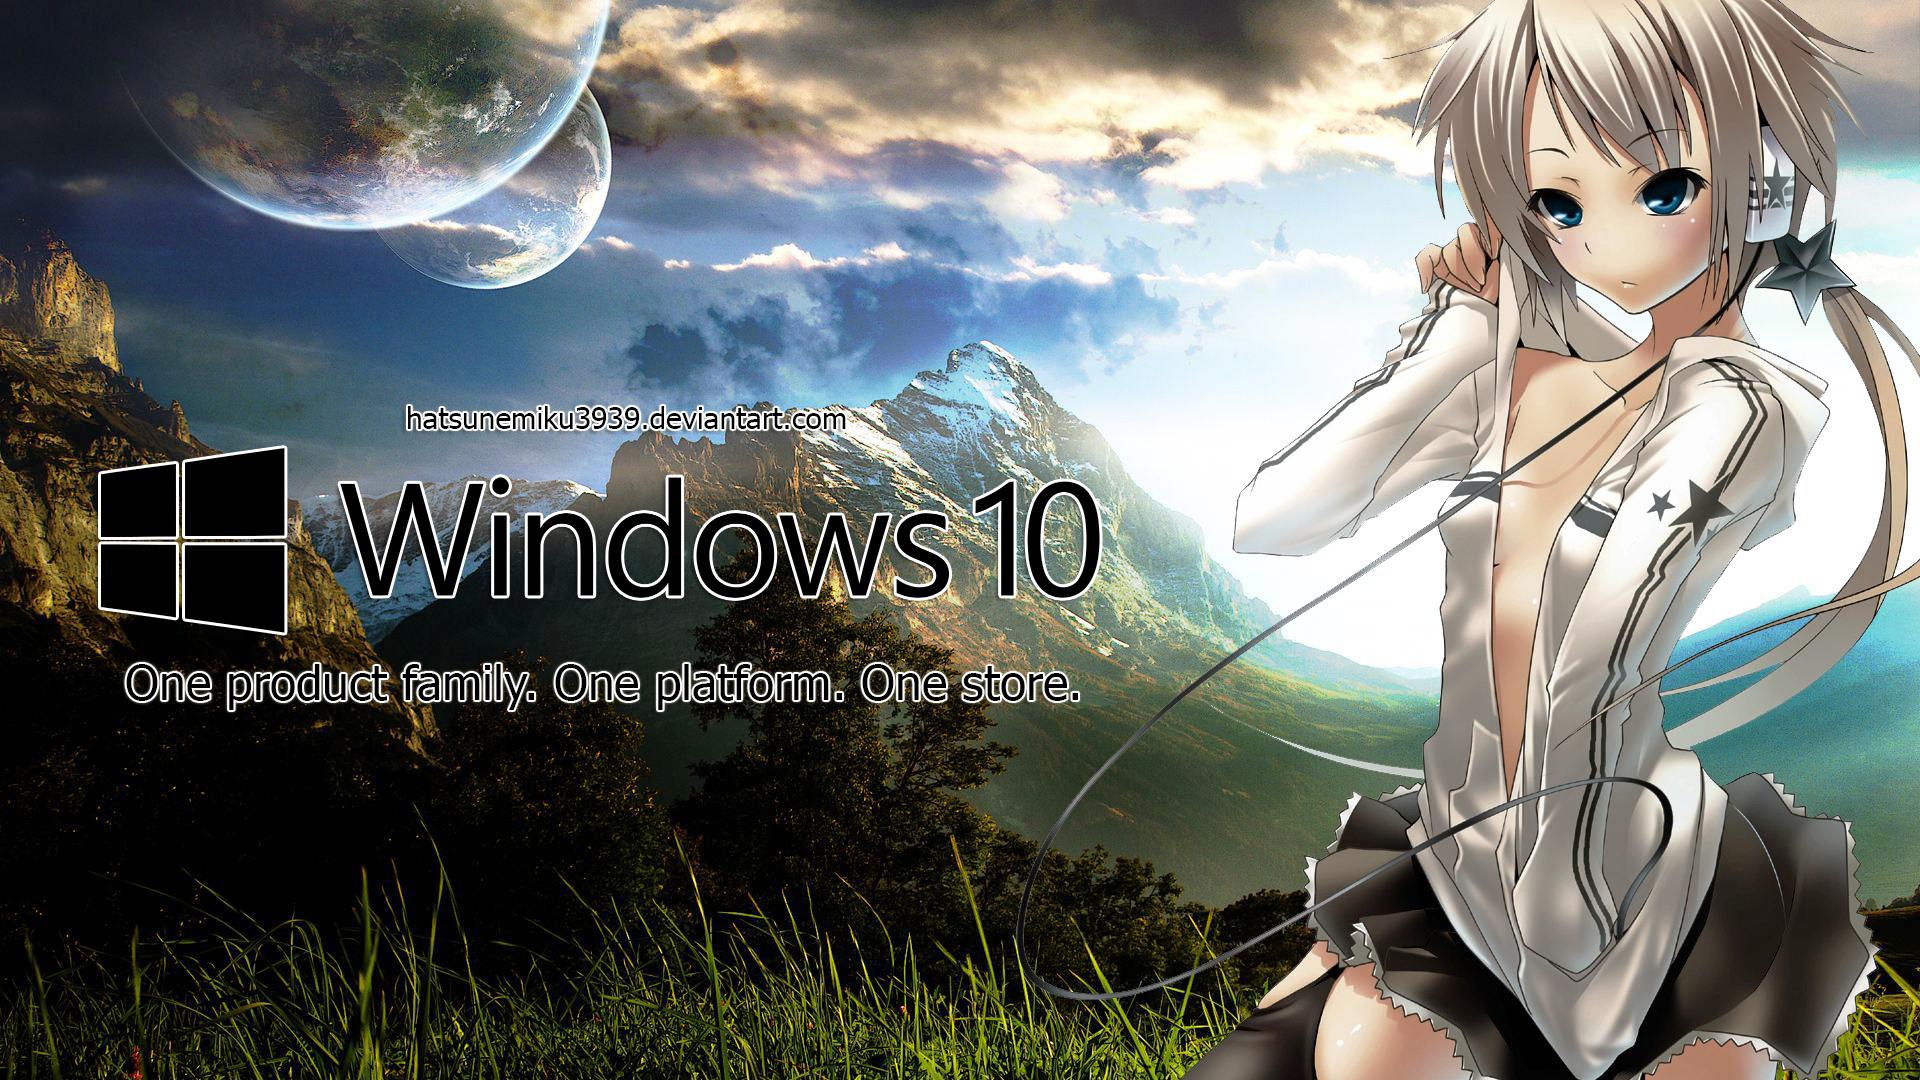 Windows 10 Anime Wallpaper By Hatsunemiku3939 On Deviantart